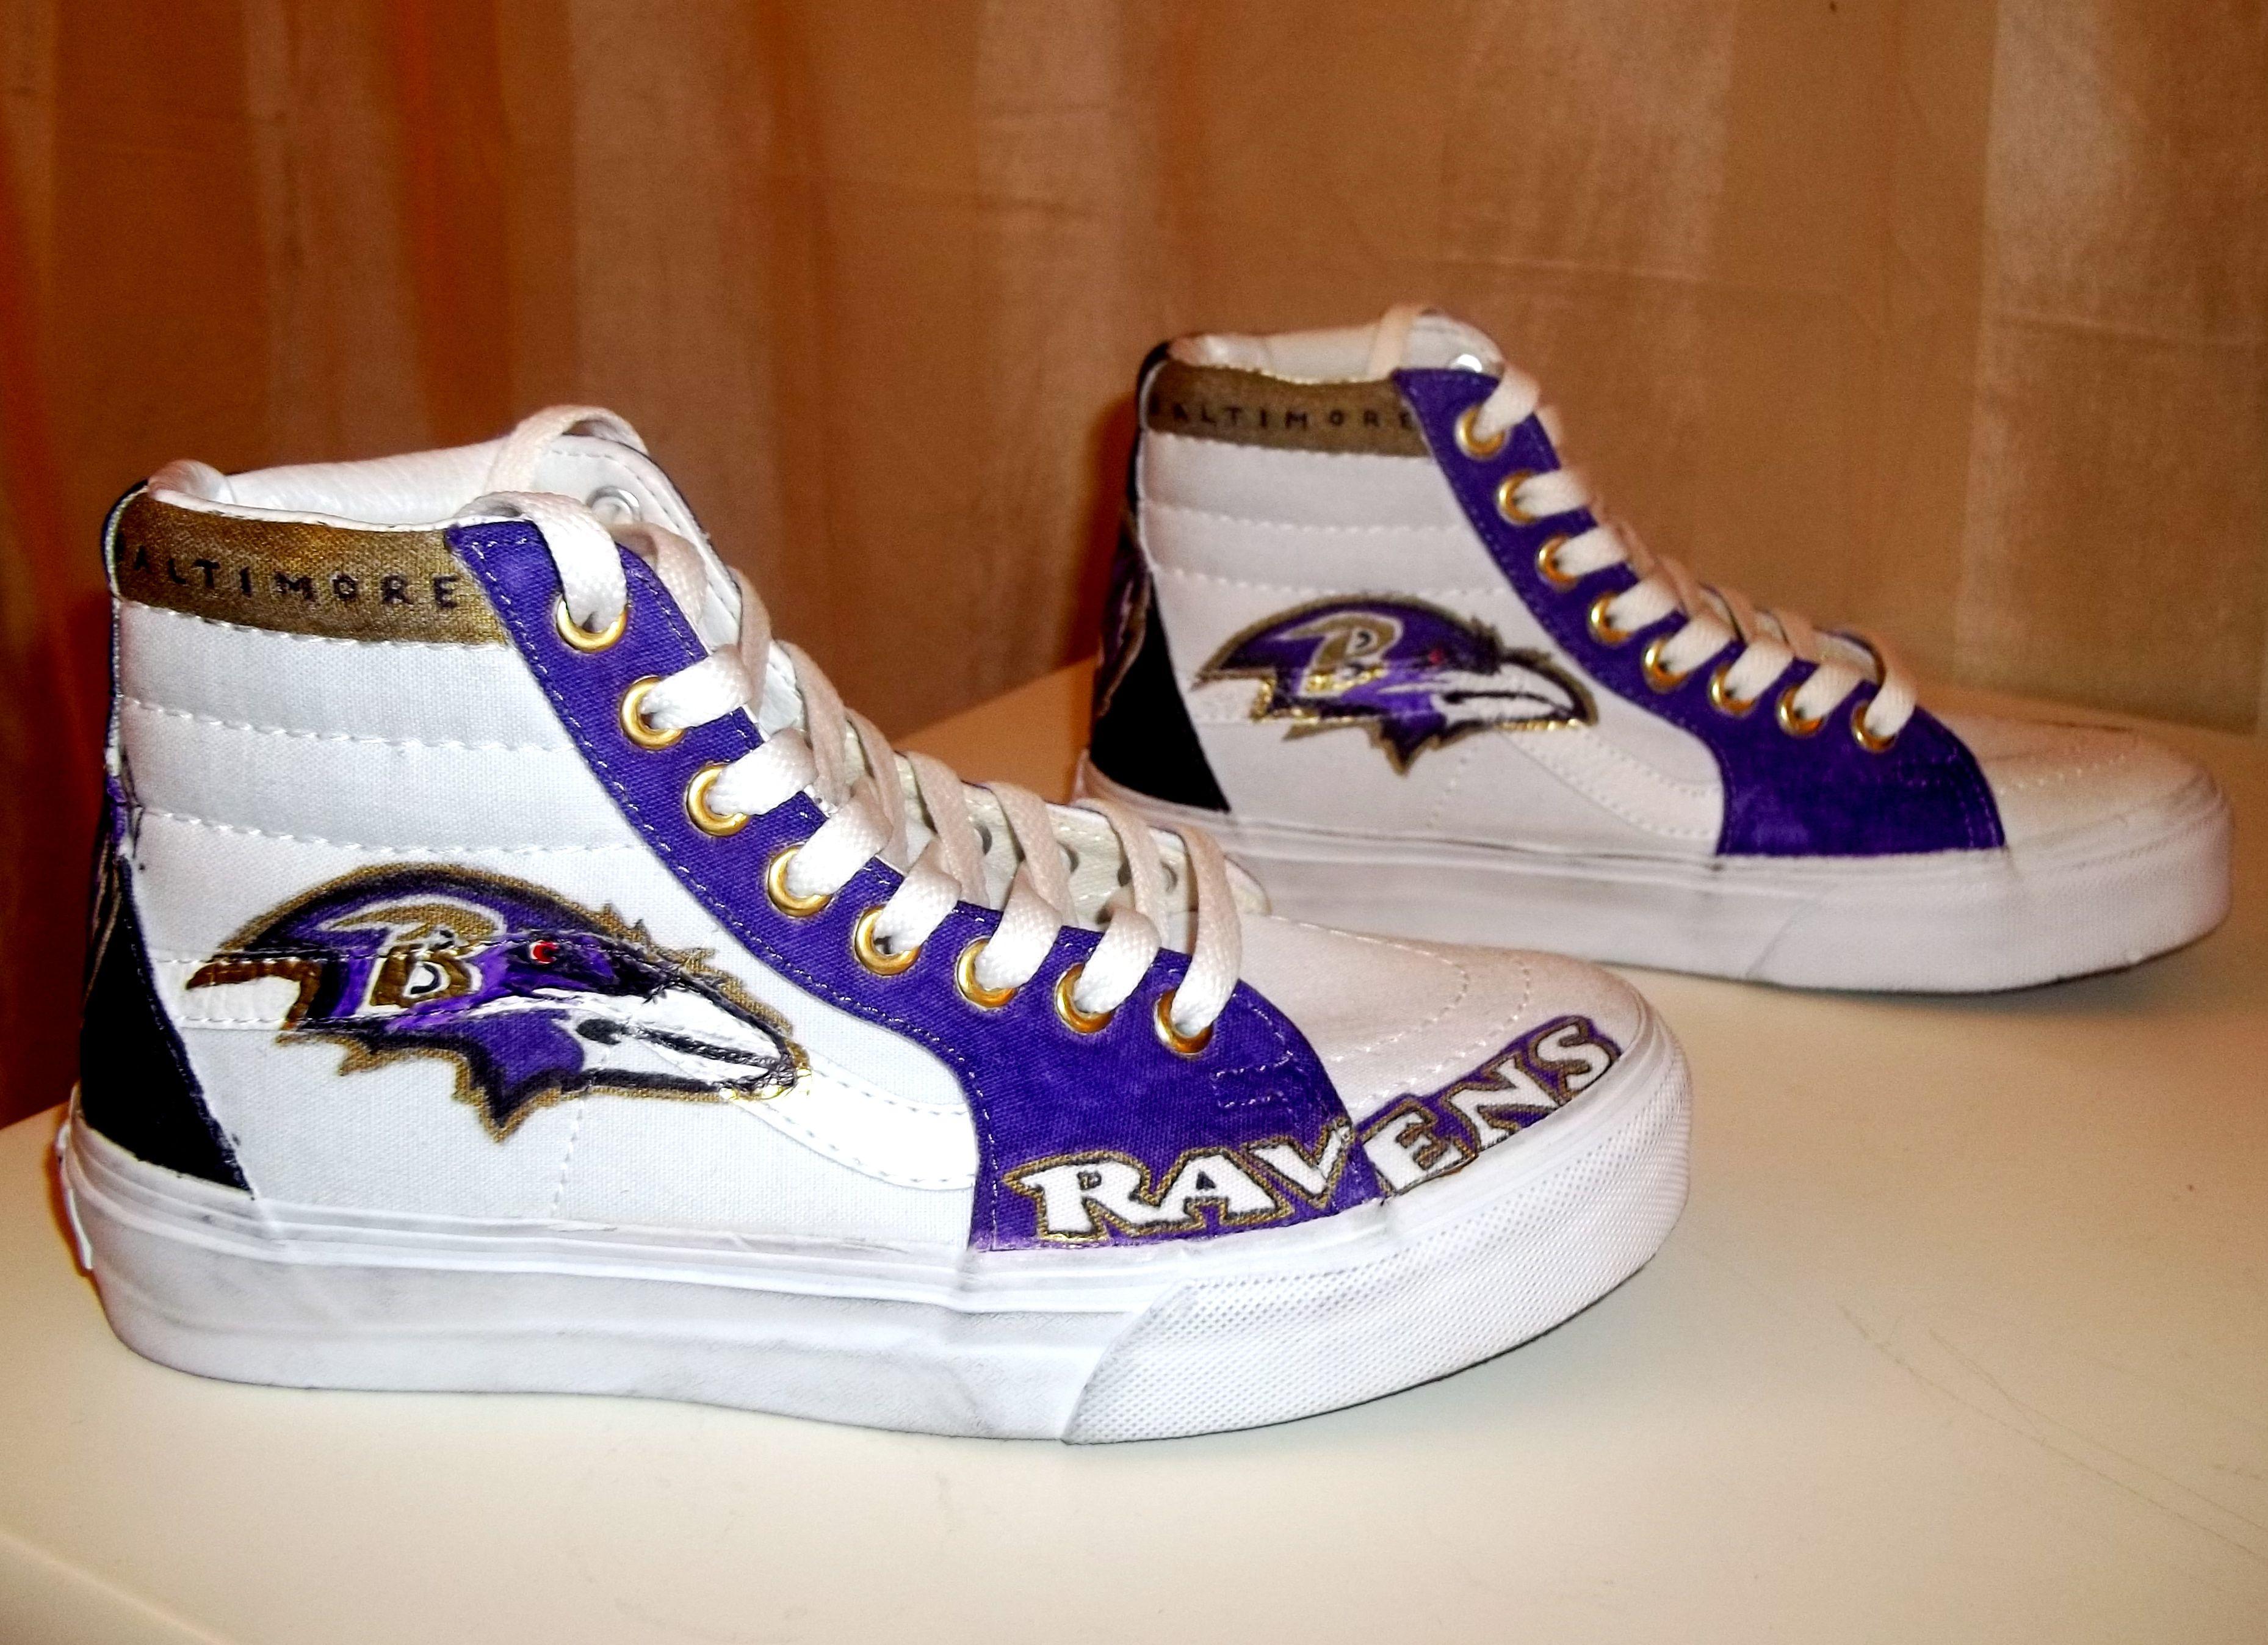 Handmade Baltimore Ravens Shoes Vans High tops u0026 Sharpie & Handmade Baltimore Ravens Shoes Vans High tops u0026 Sharpie | My ... islam-shia.org